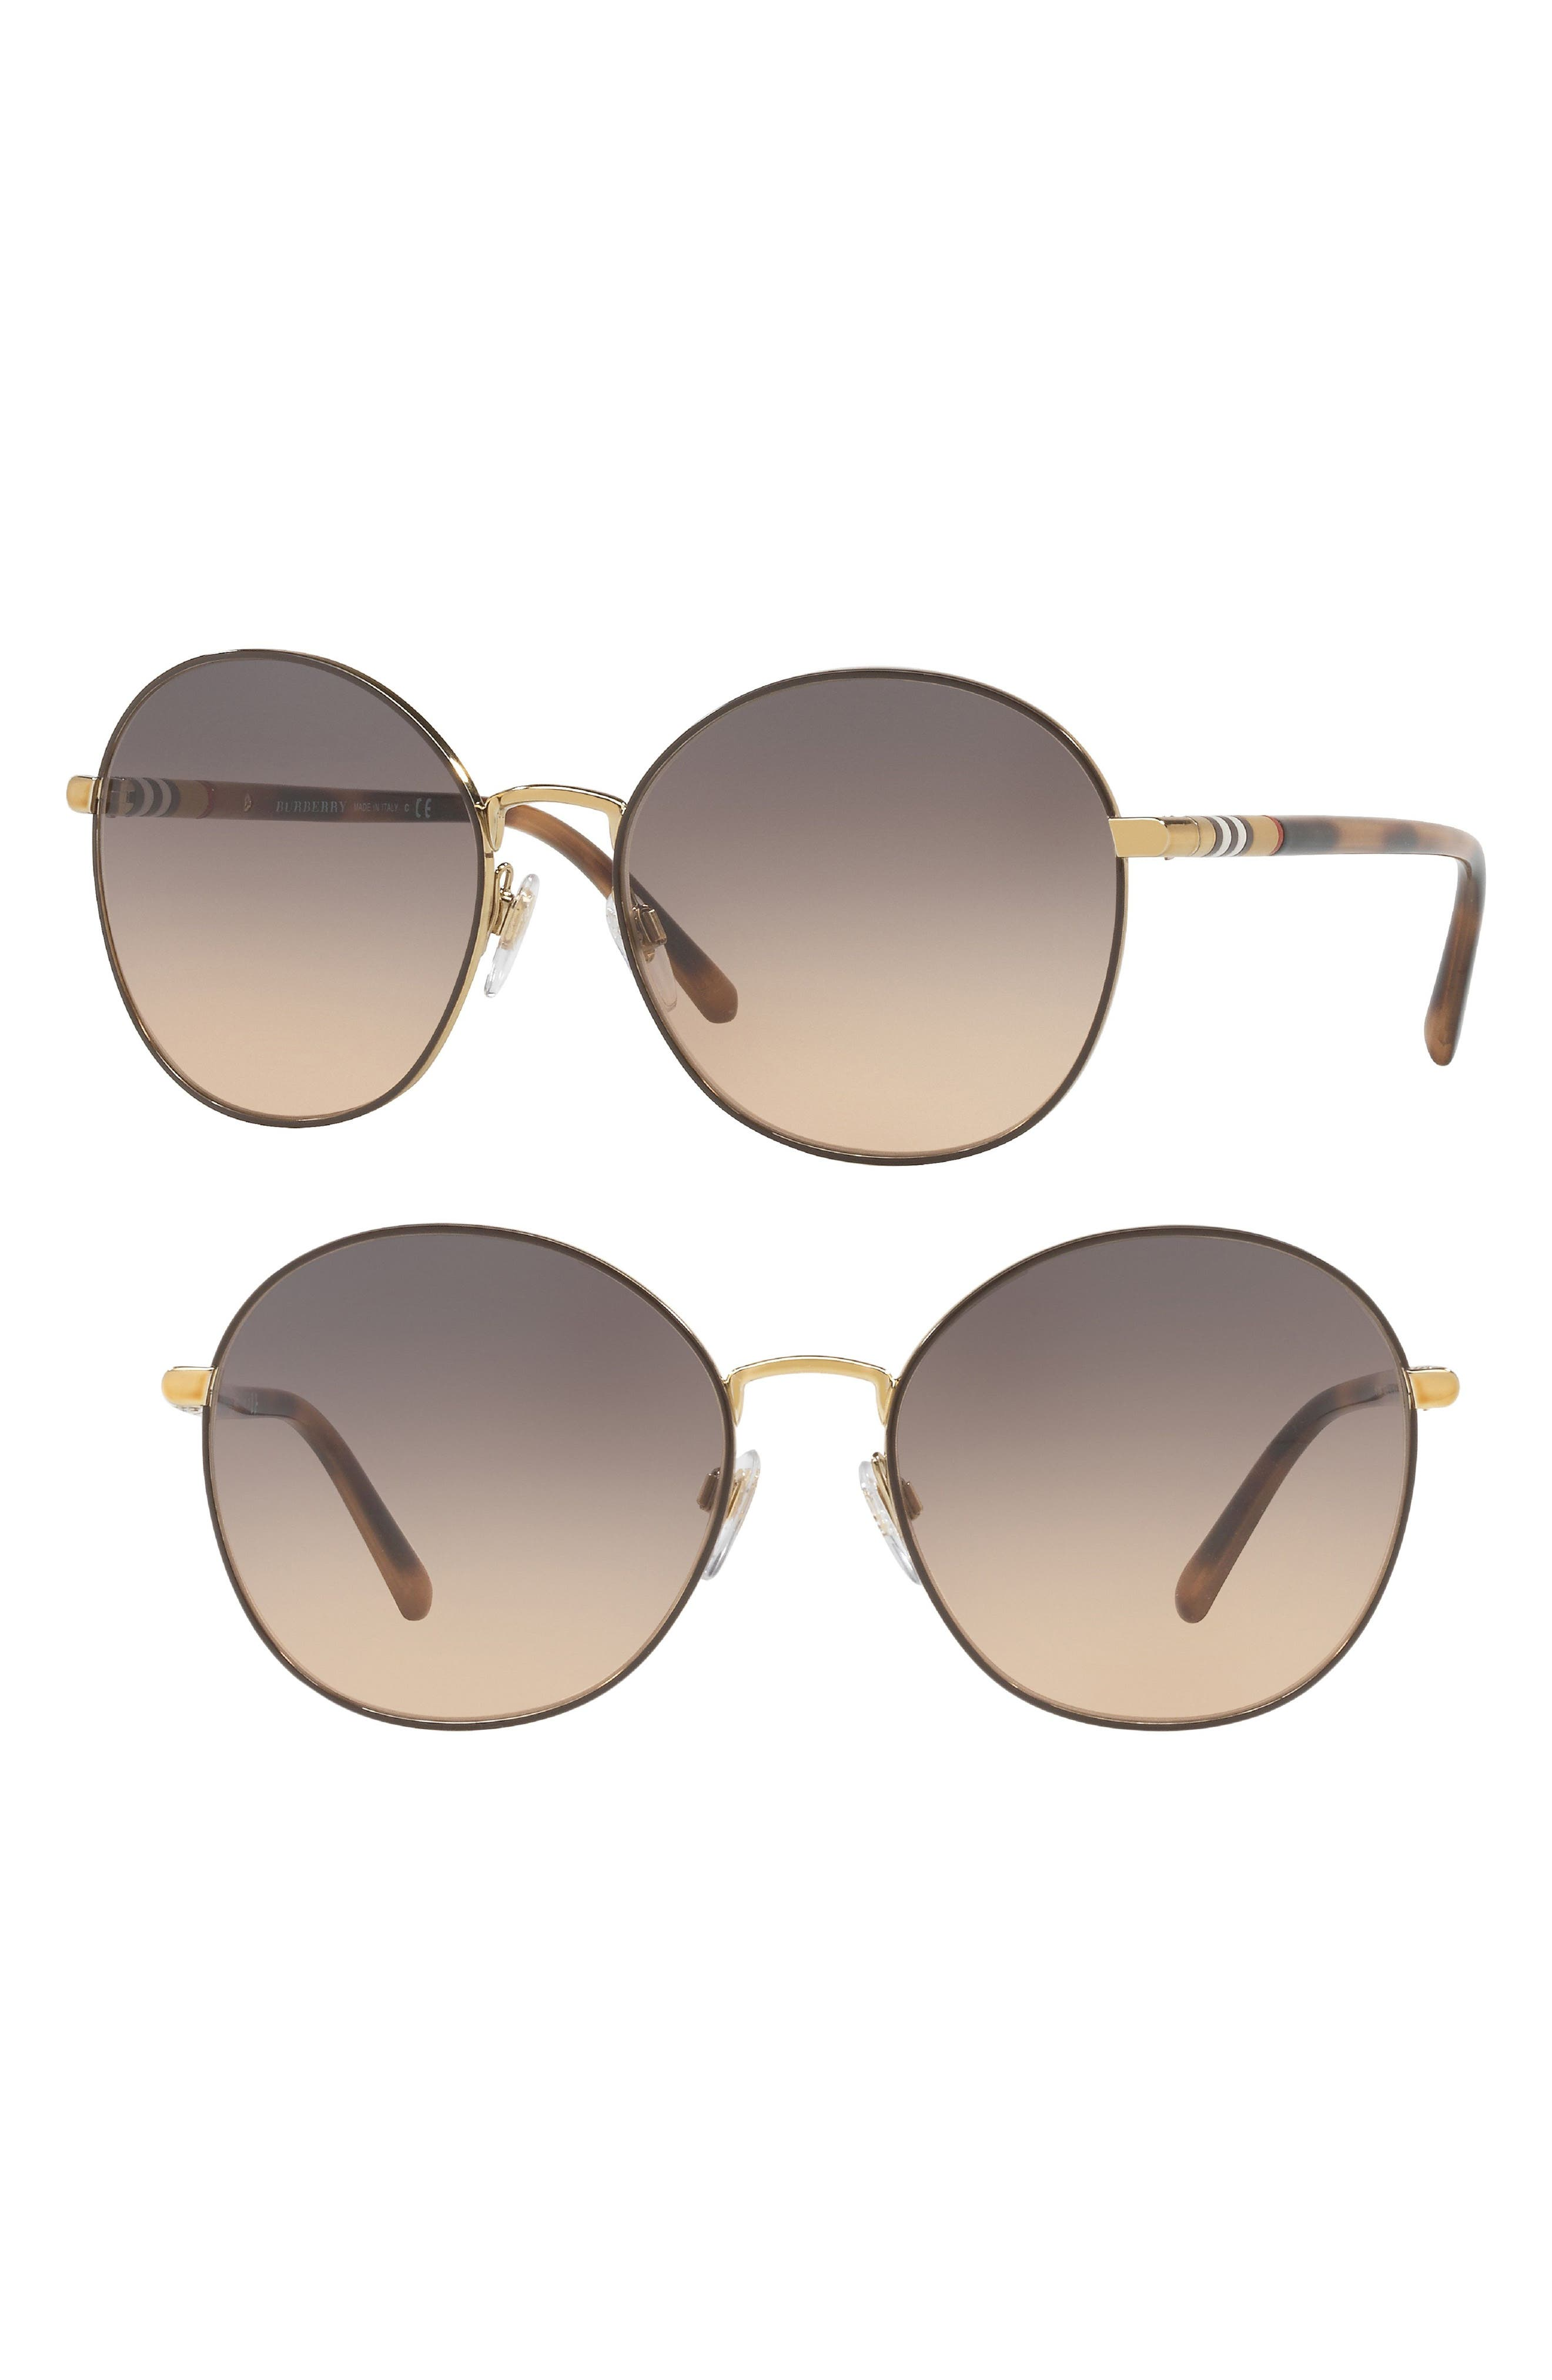 Burberry 56mm Gradient Round Sunglasses